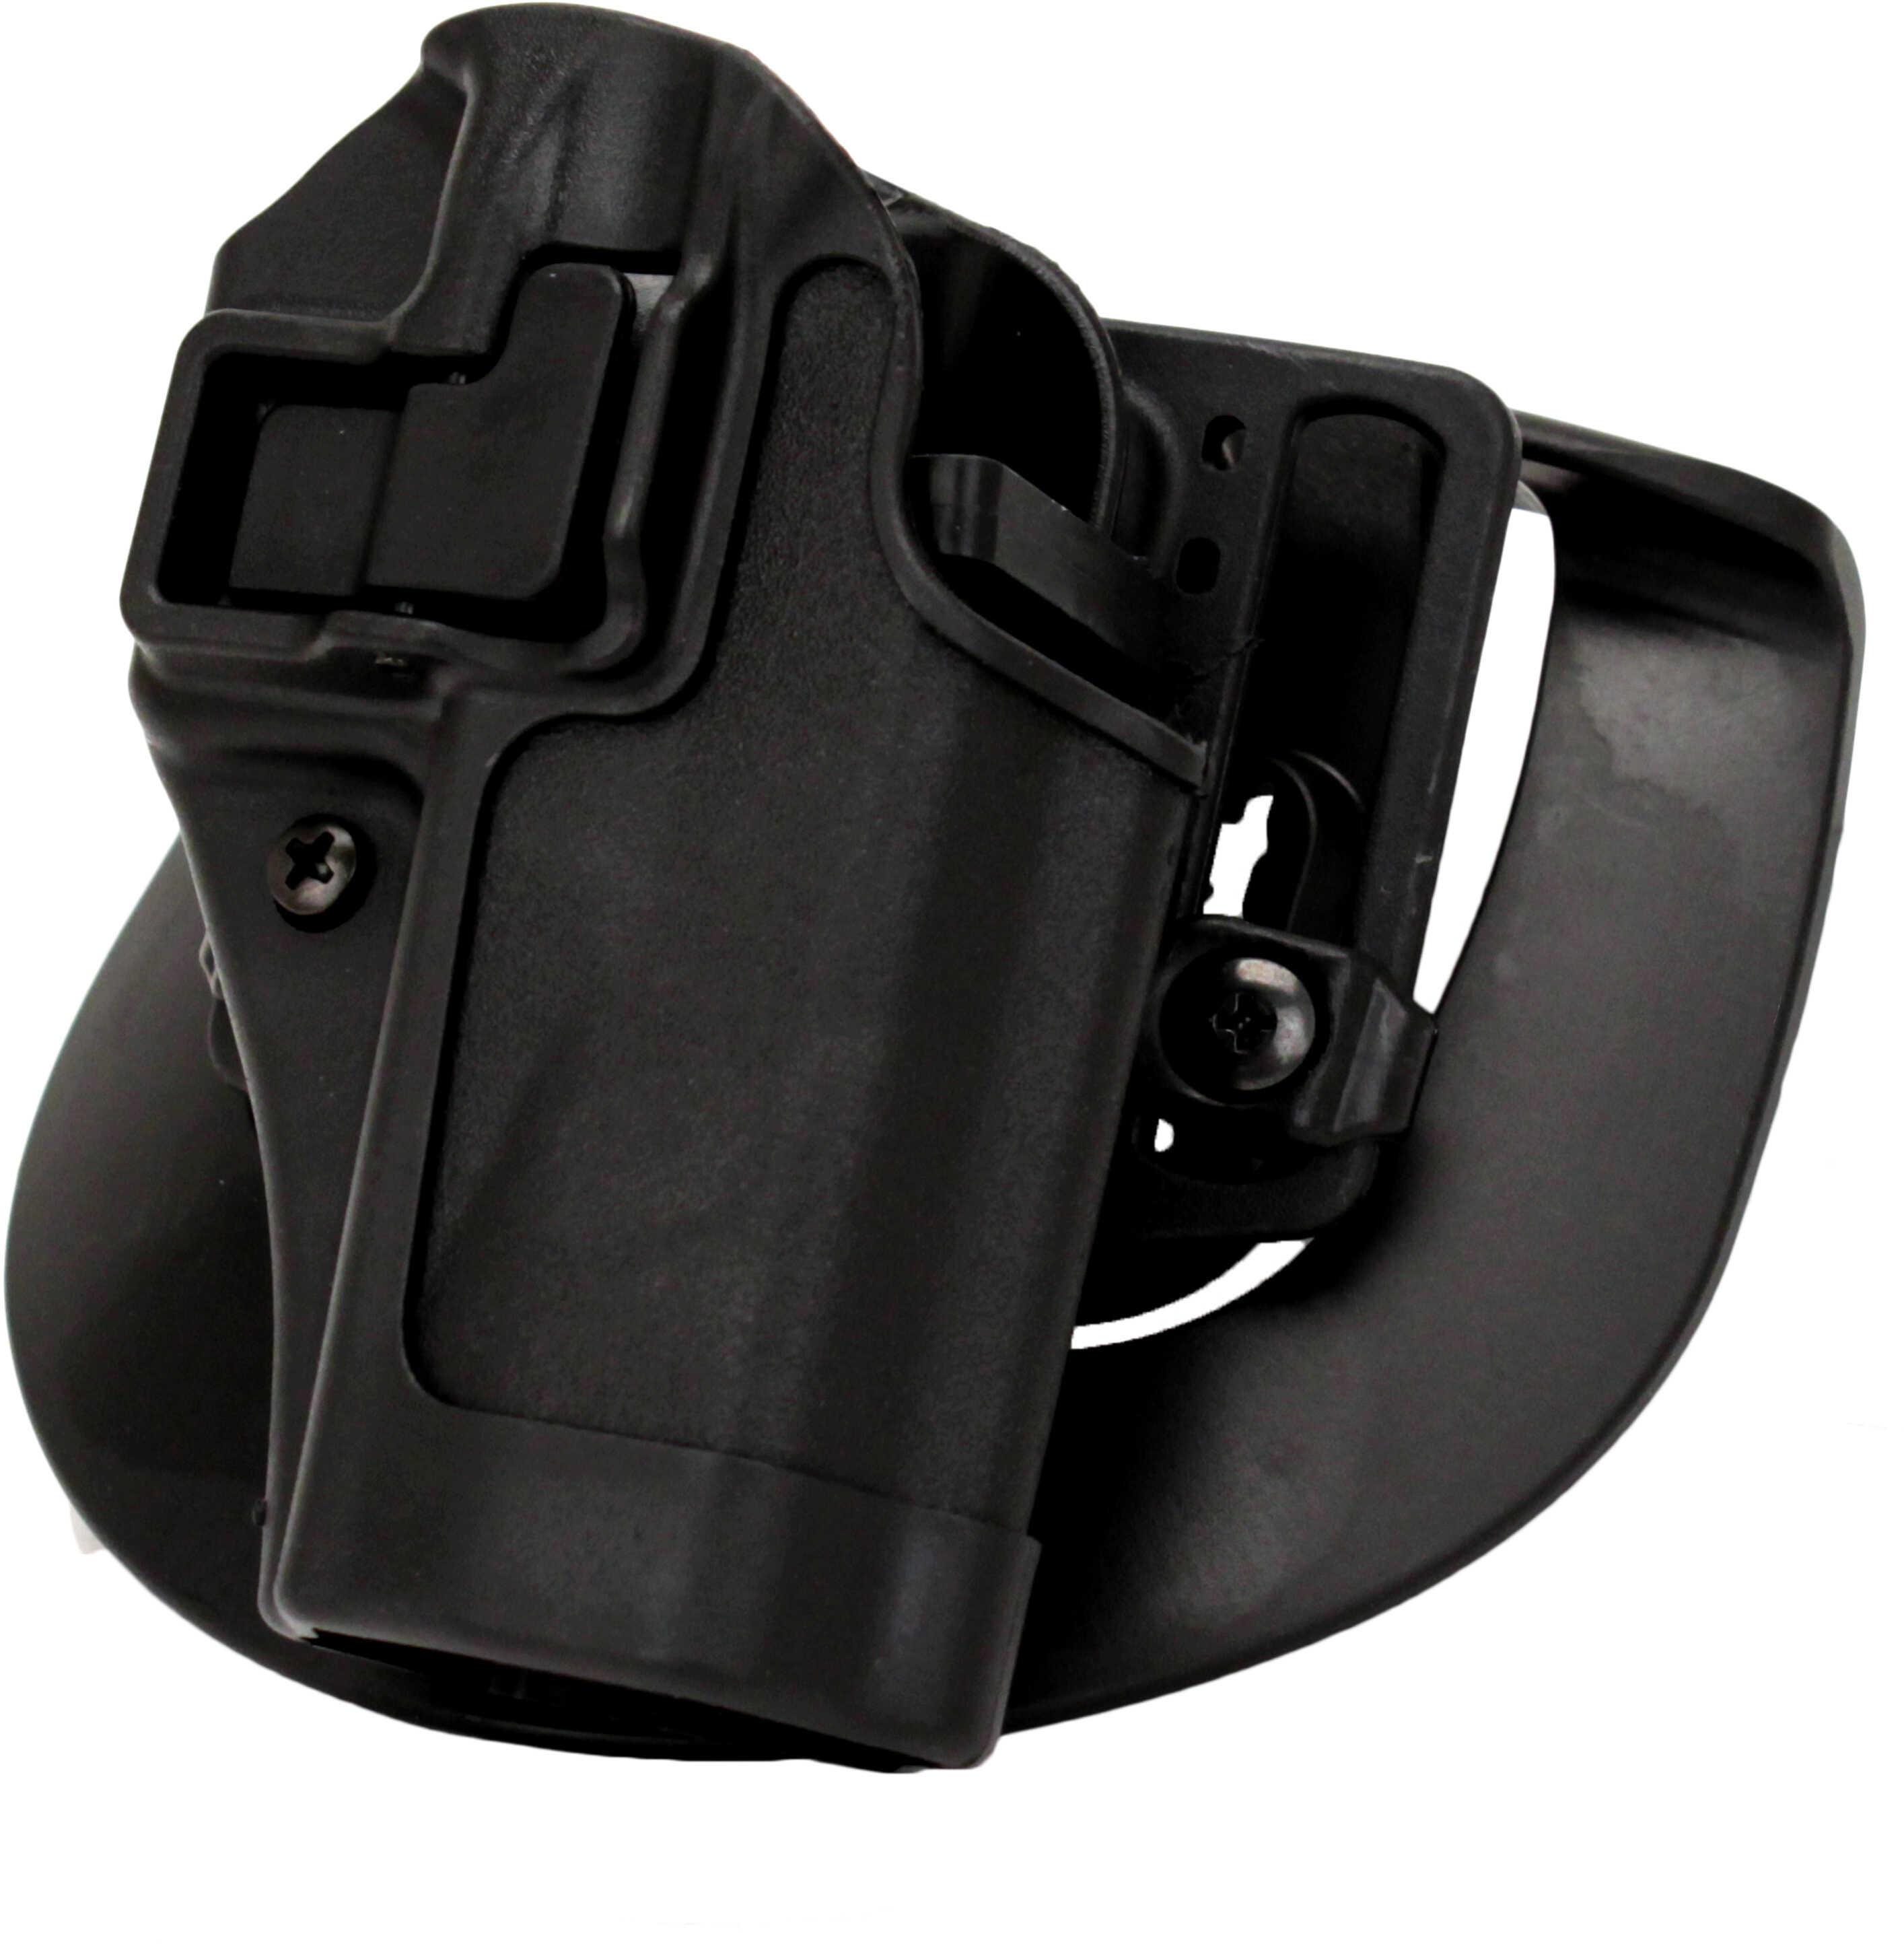 BlackHawk Products Group Serpa CF, Belt & Paddle Holster, Plain Matte Black Finish S&W M&P, Sigma, Right Hand 410525BK-R